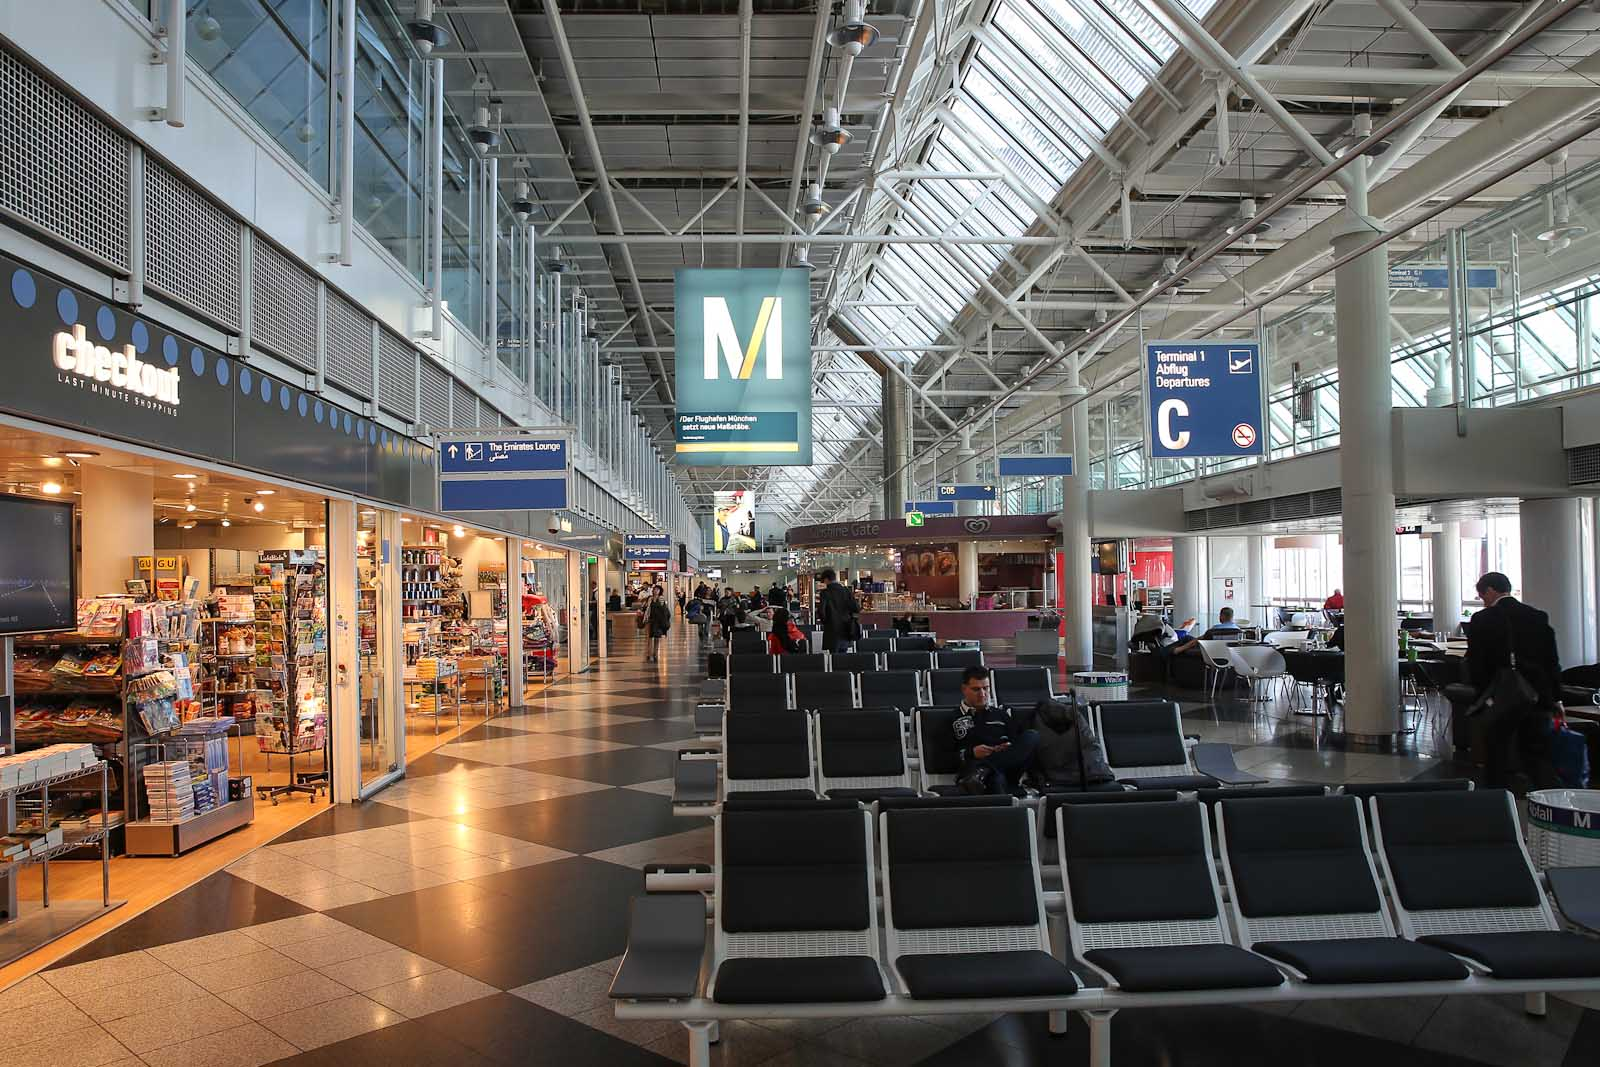 Транзитный аэропорт в Мюнхене фото